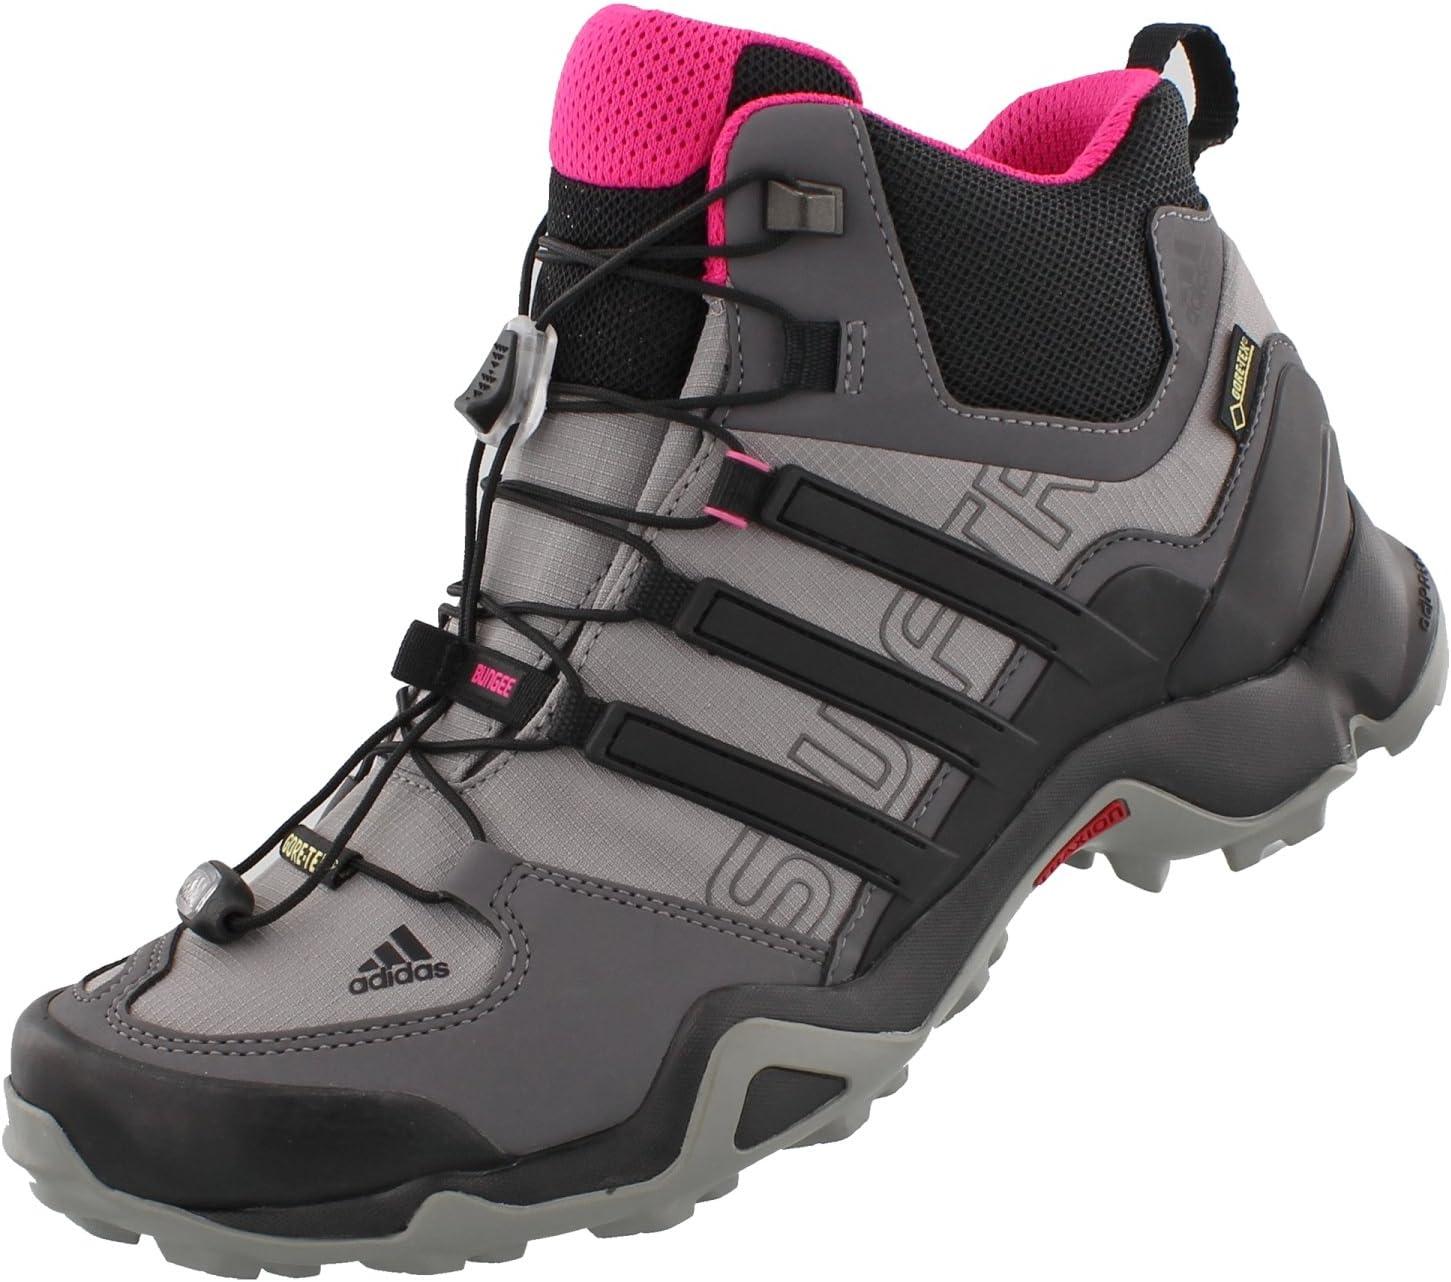 Adidas Outdoor Terrex Swift R Mid GTX Hiking Boot Women